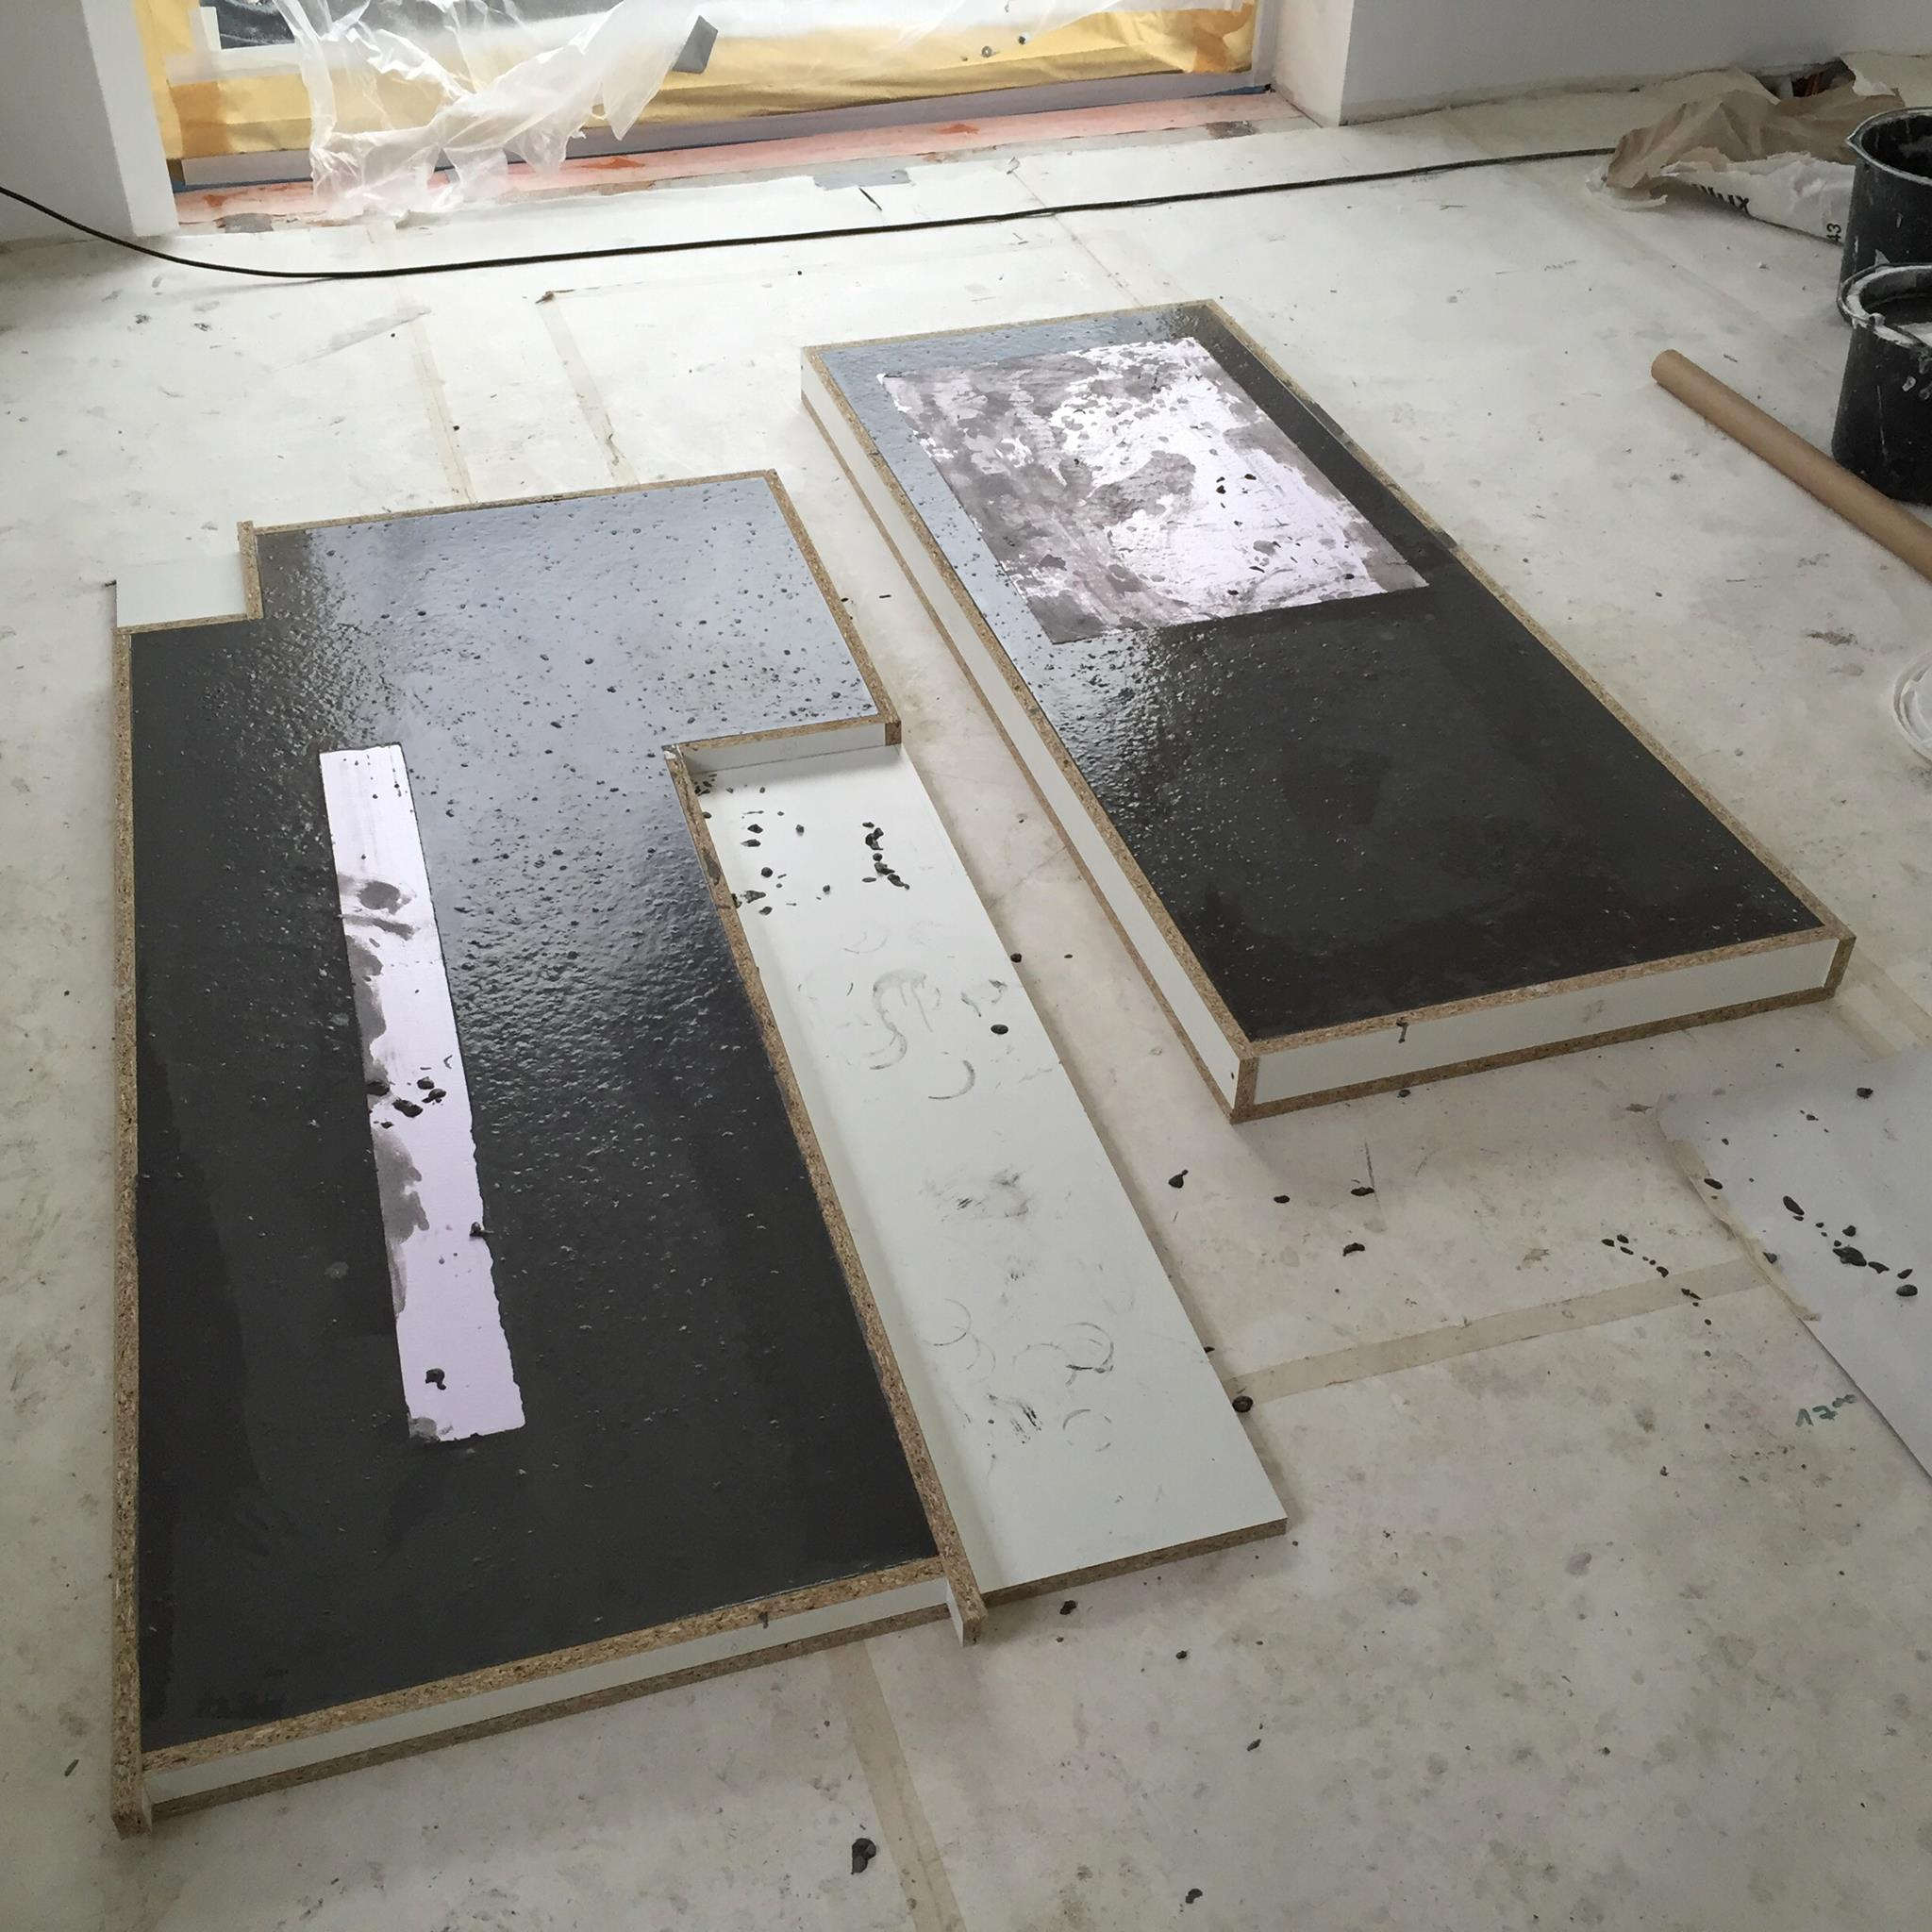 arbeitsplatten aus beton diy anleitung mit betonrezept. Black Bedroom Furniture Sets. Home Design Ideas